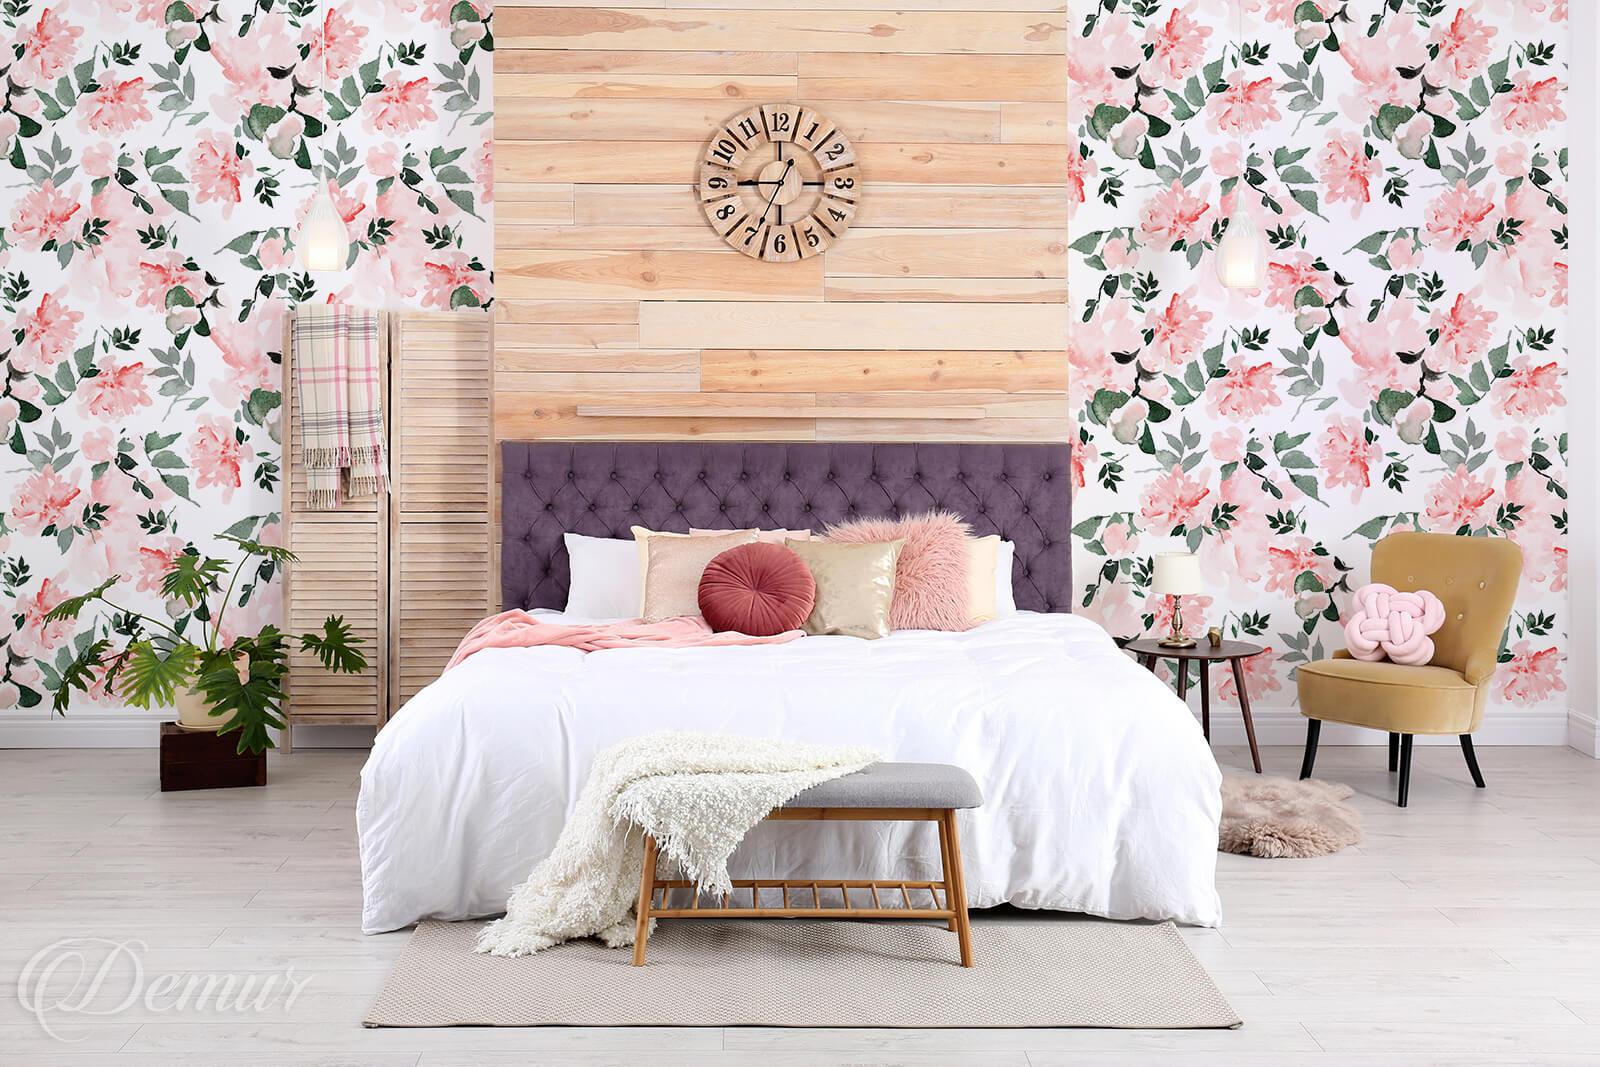 Tapeta Pastelowe róże - Tapety do sypialni - Demur